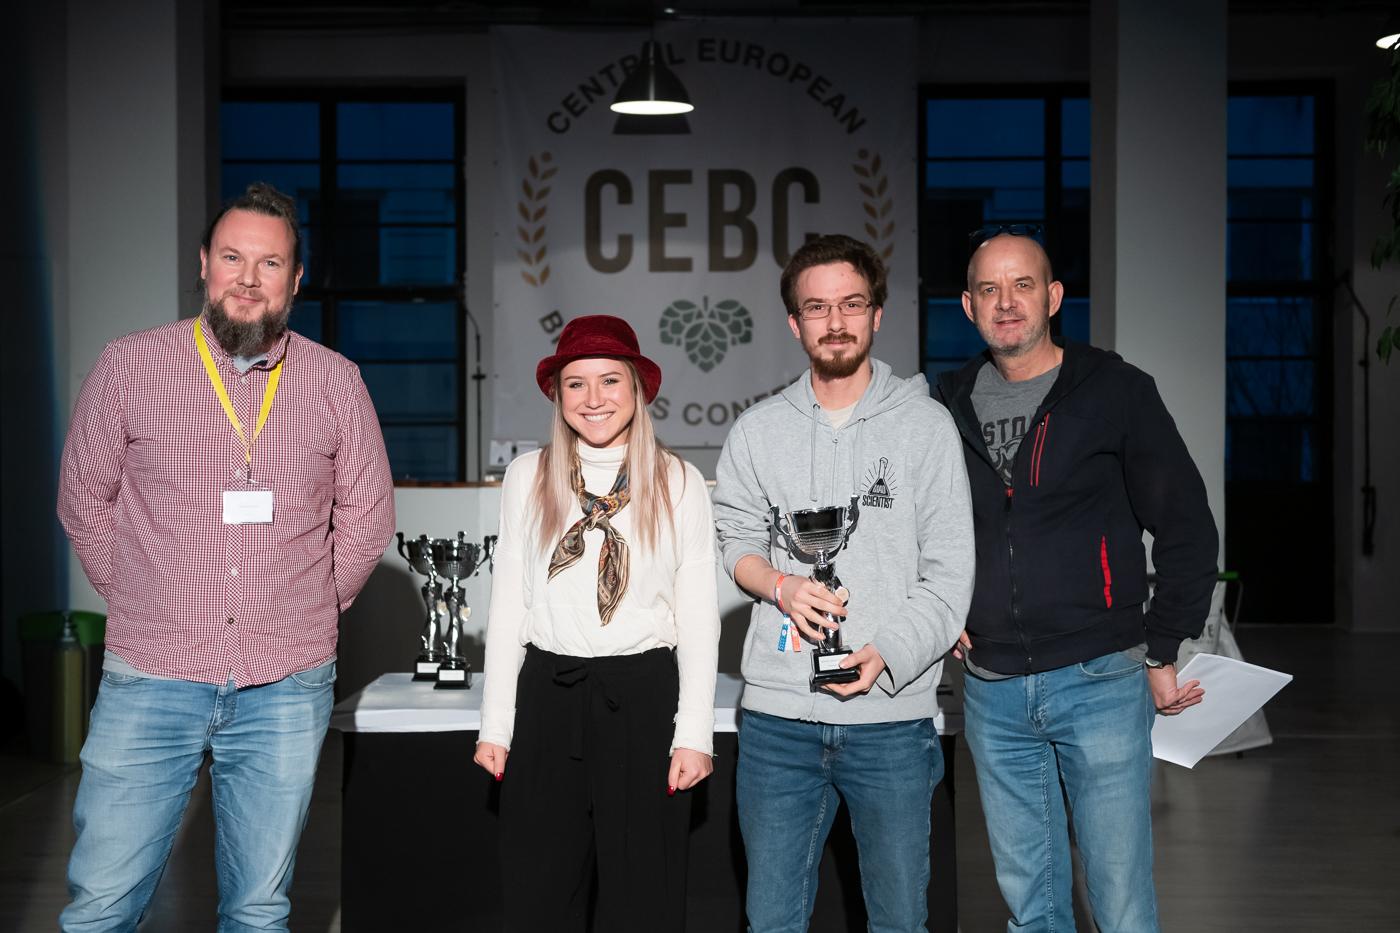 European Craft Beer Cup (ECBC) a díjazottak: <br /> Fotó: CEBC